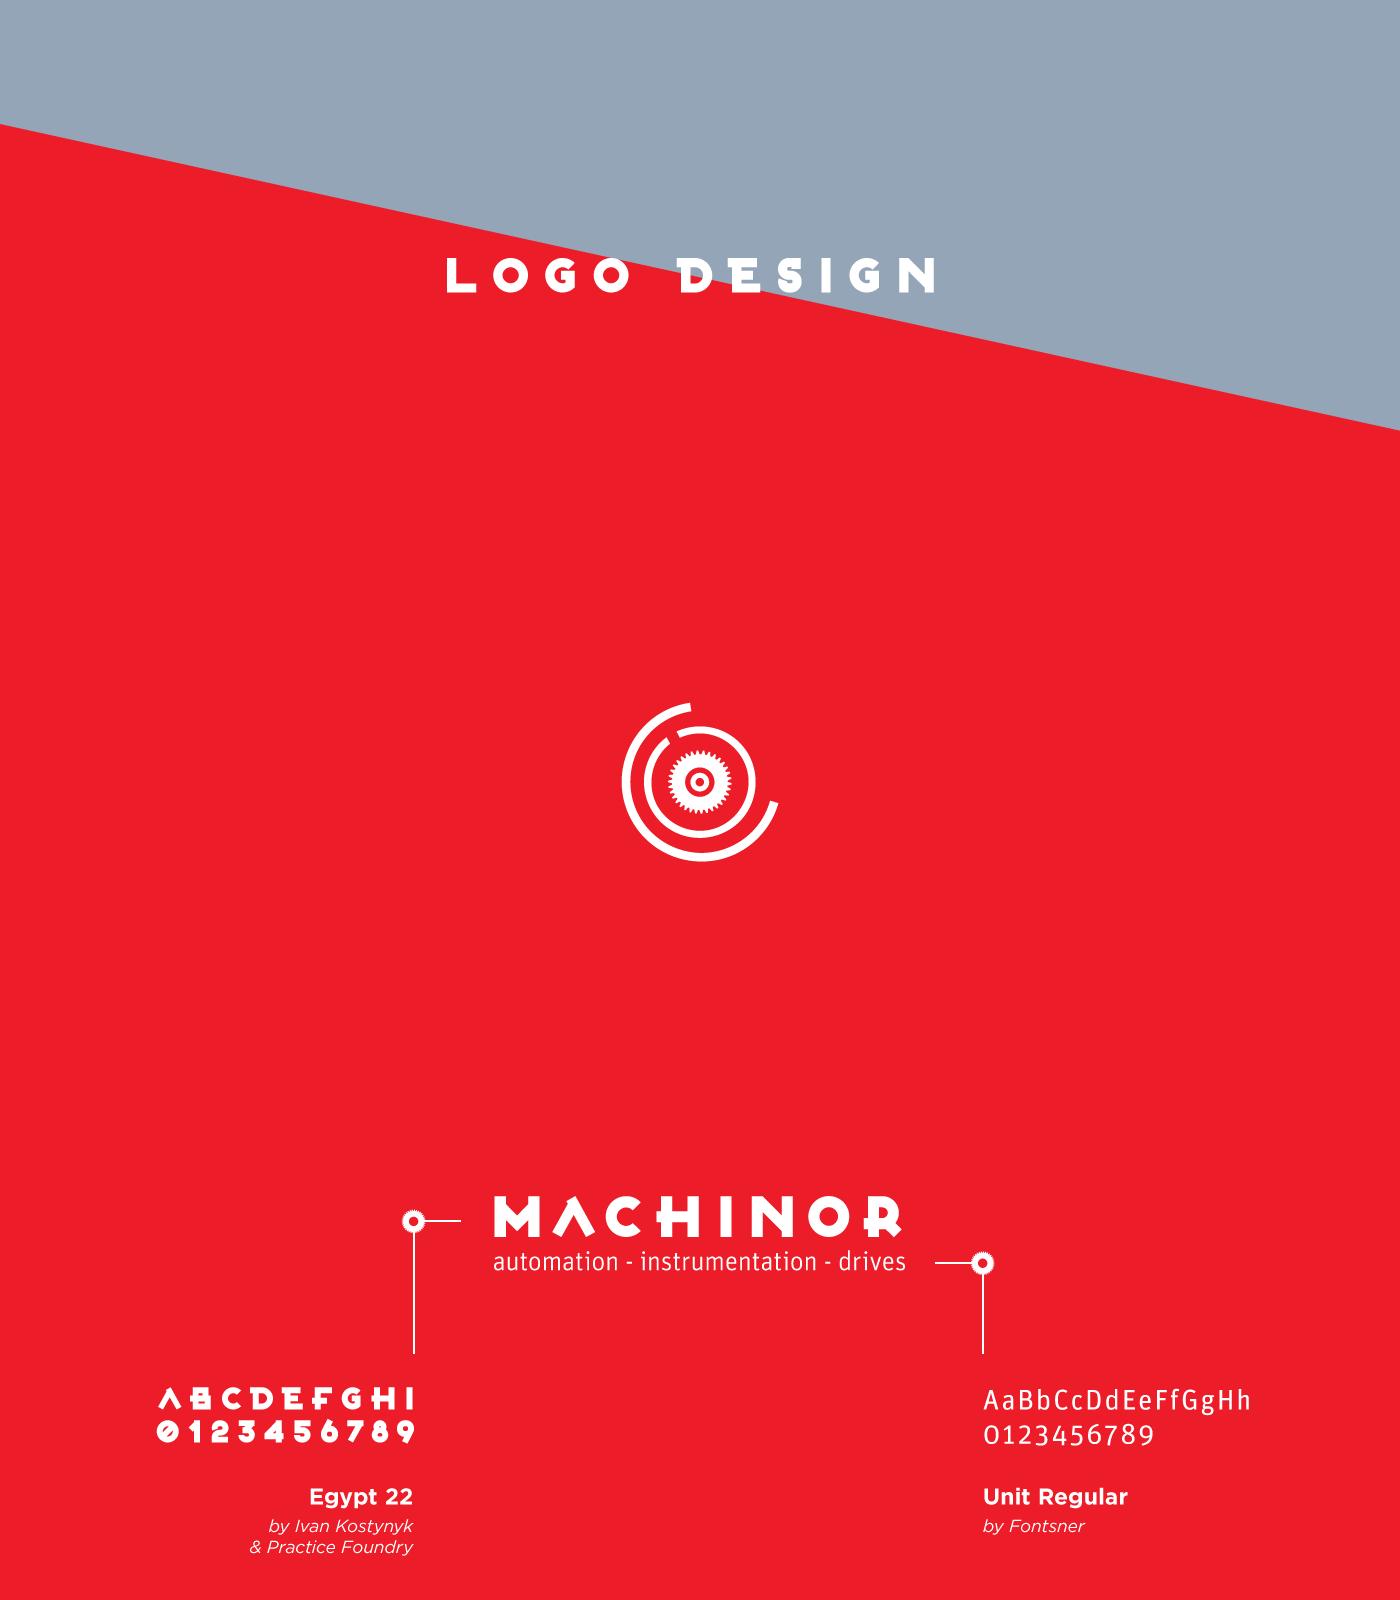 Machinor S A △ Branding on Behance